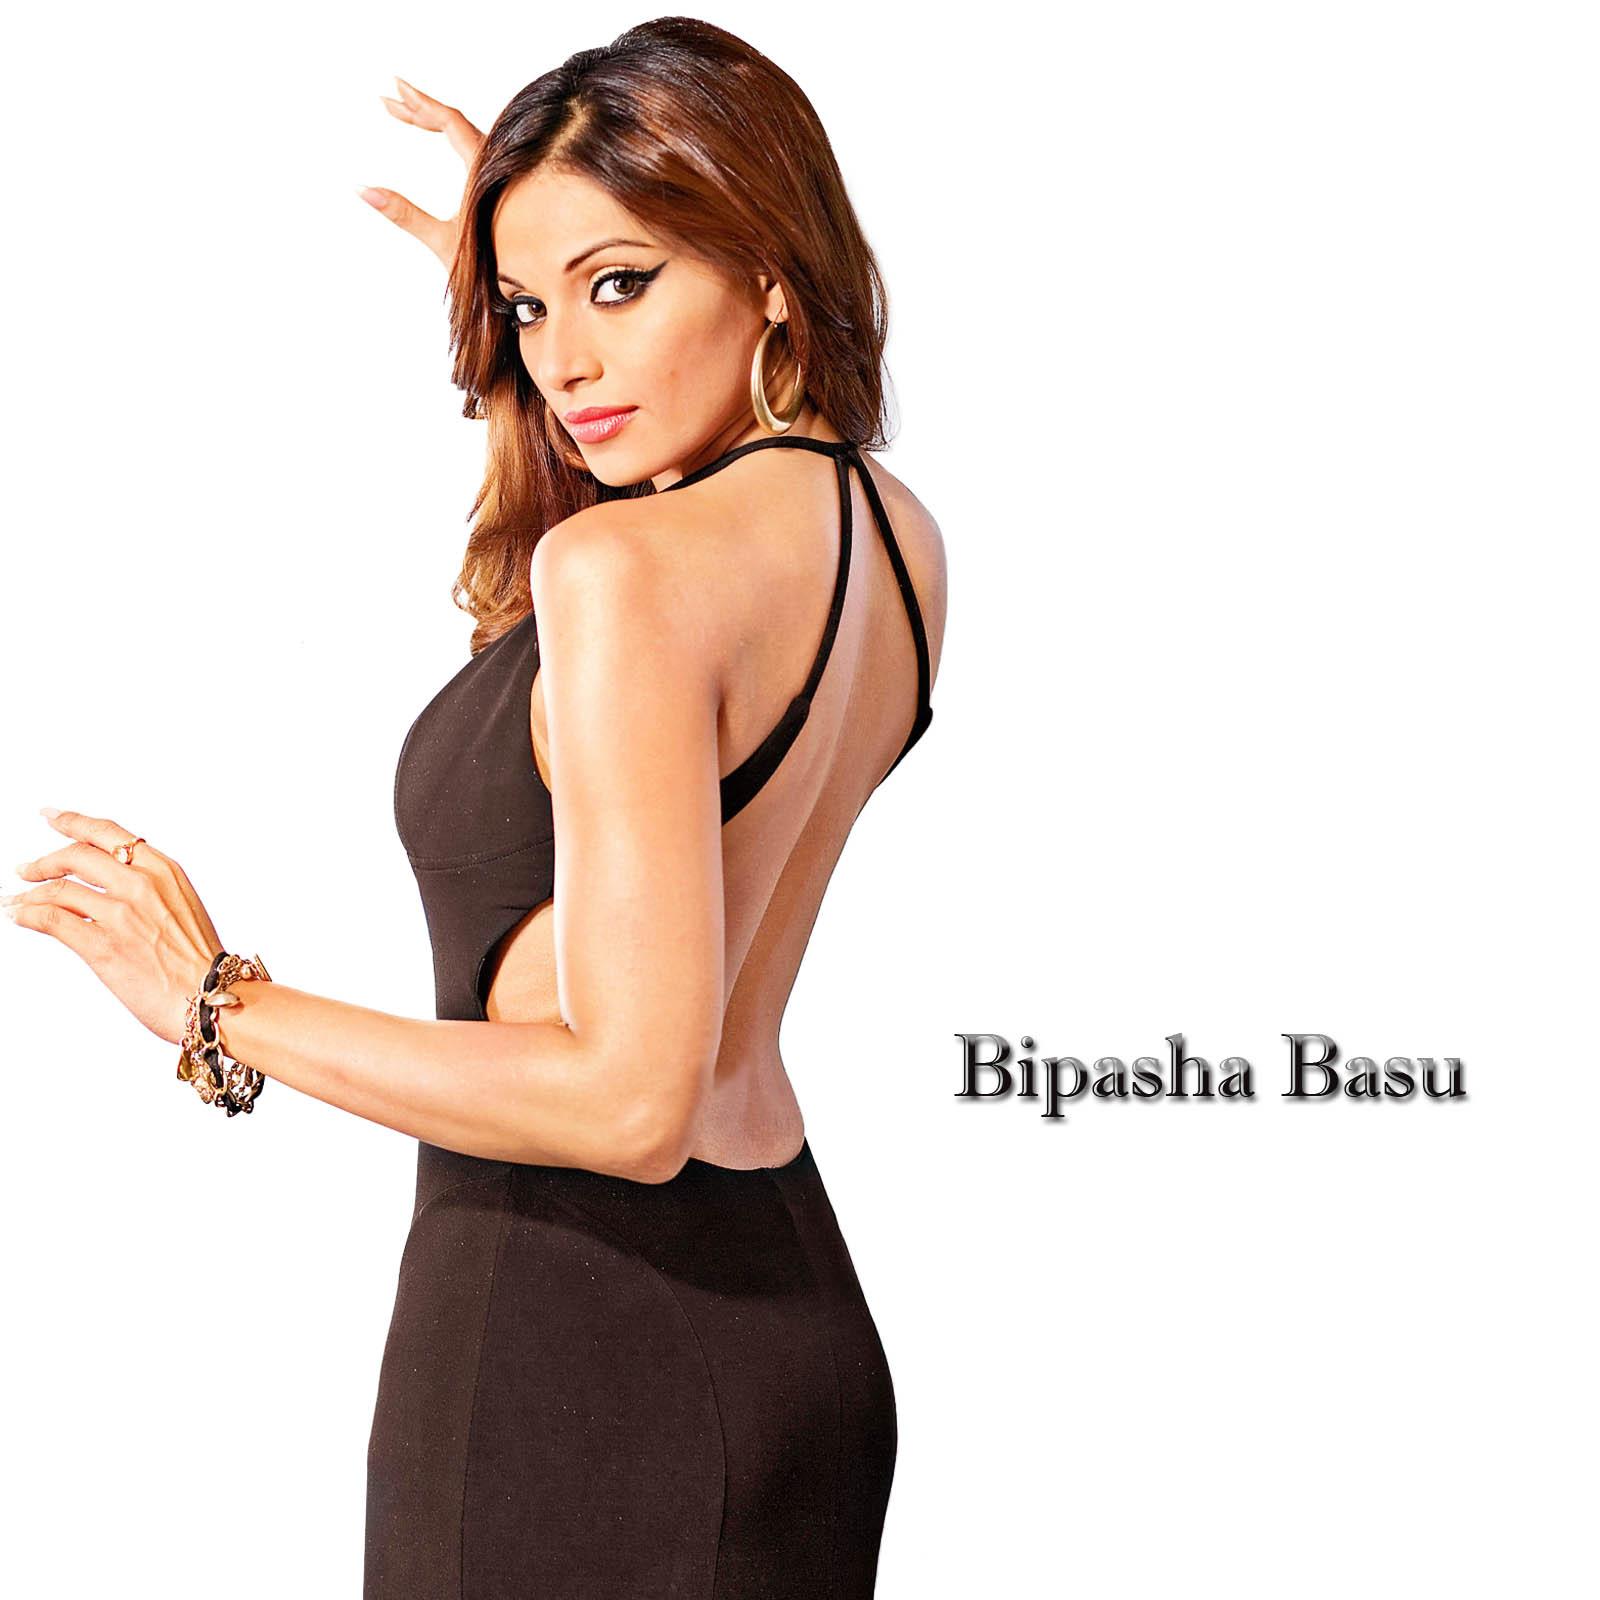 Bipasha Basu HD Wallpapers Free Download